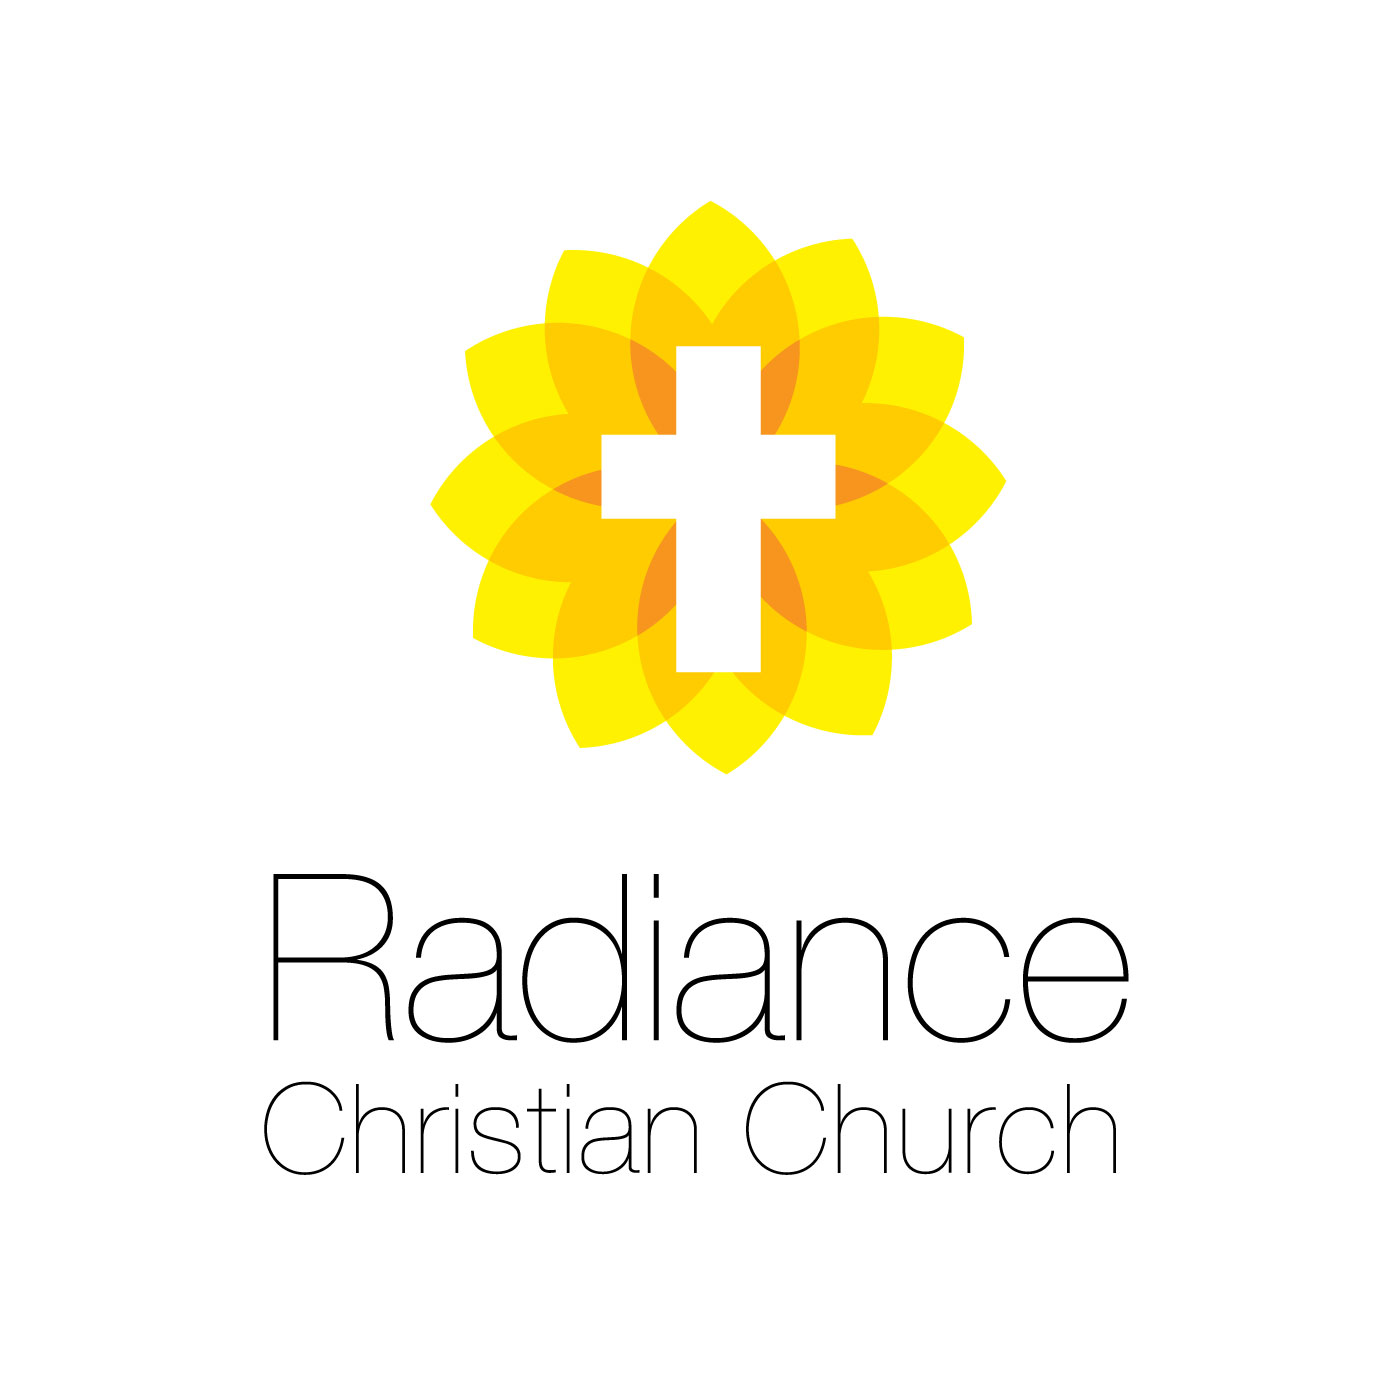 Radiance Christian Church